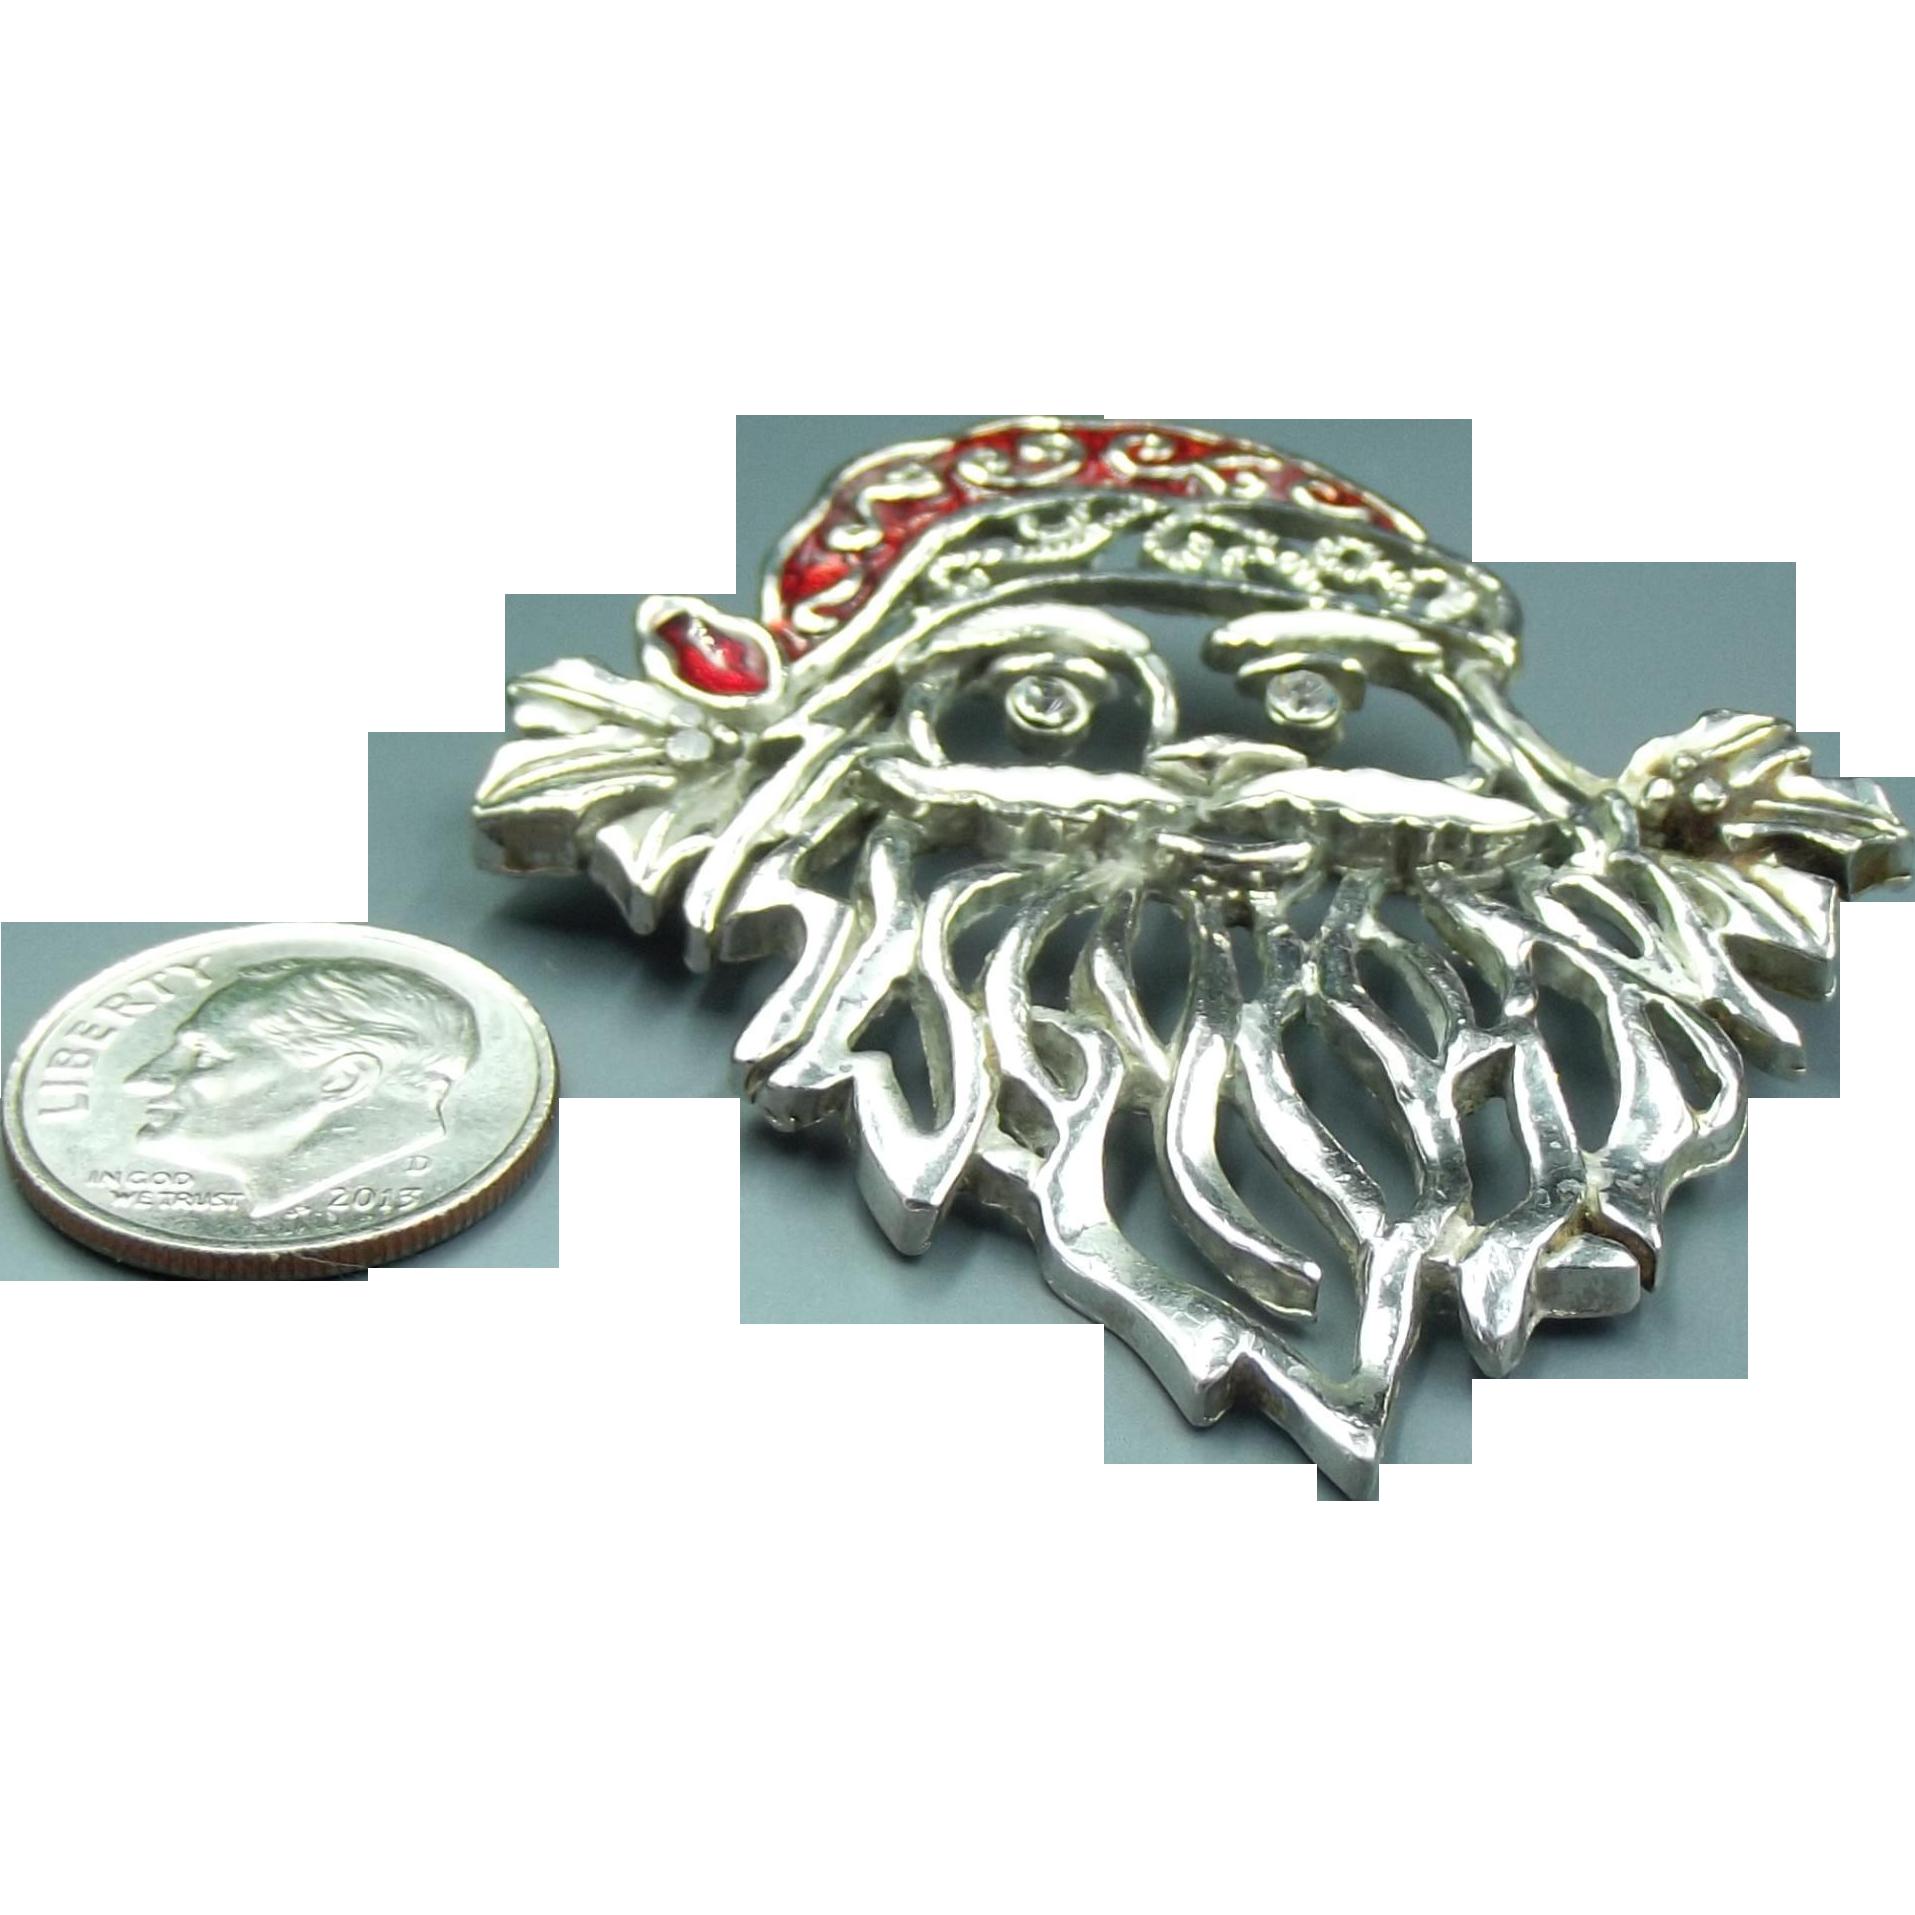 Vintage silver enamel santa claus brooch from jojosgems on